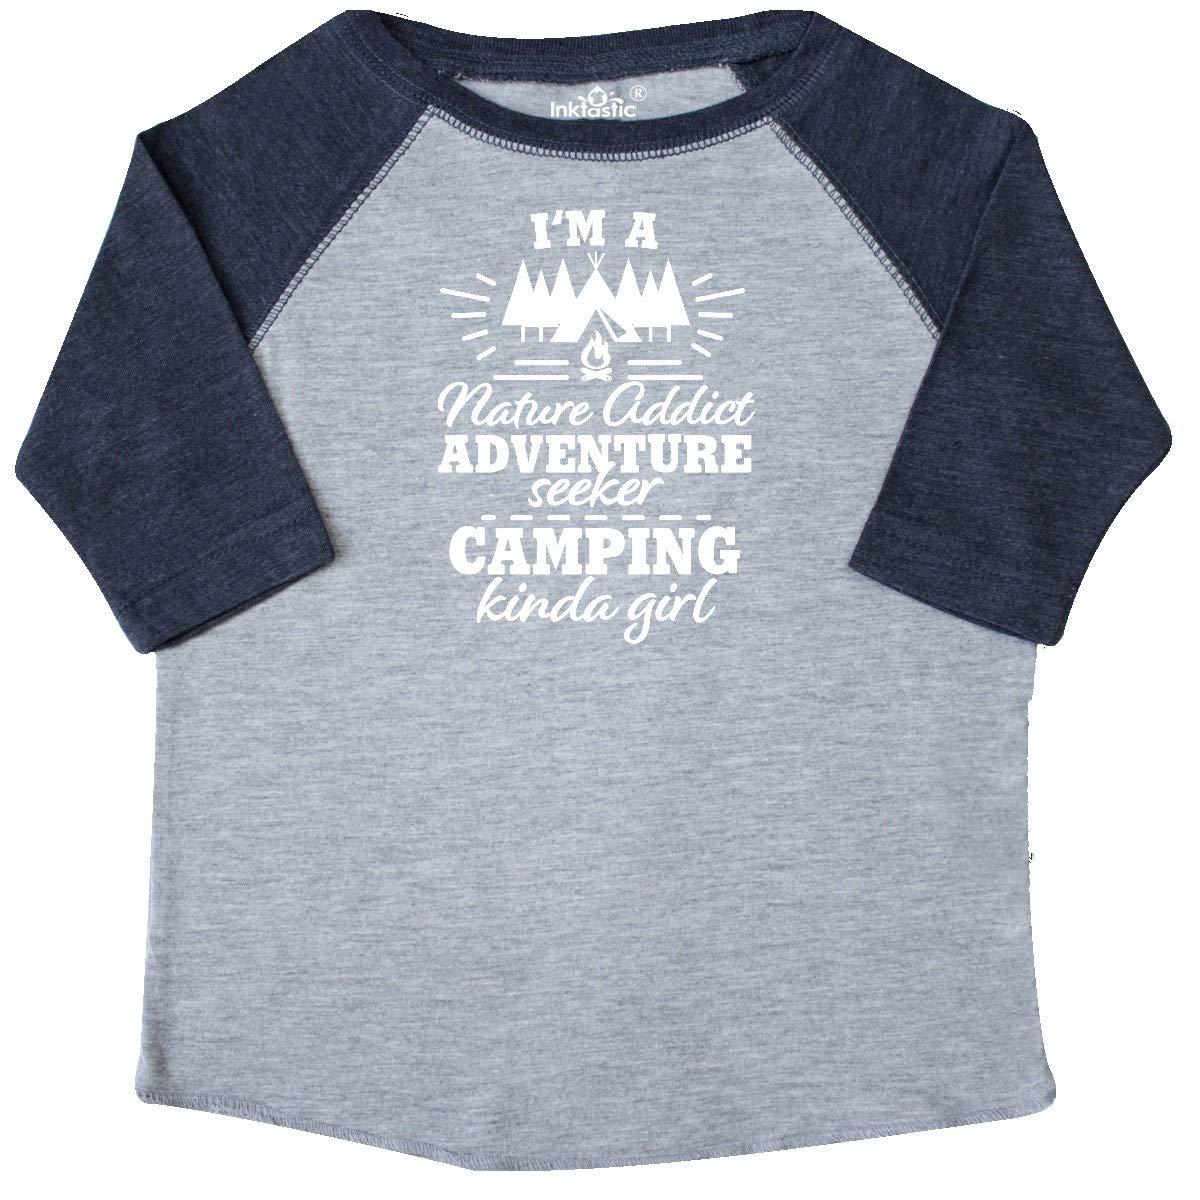 inktastic Im a Nature Addict Adventure Seeker Camping Kinda Toddler T-Shirt